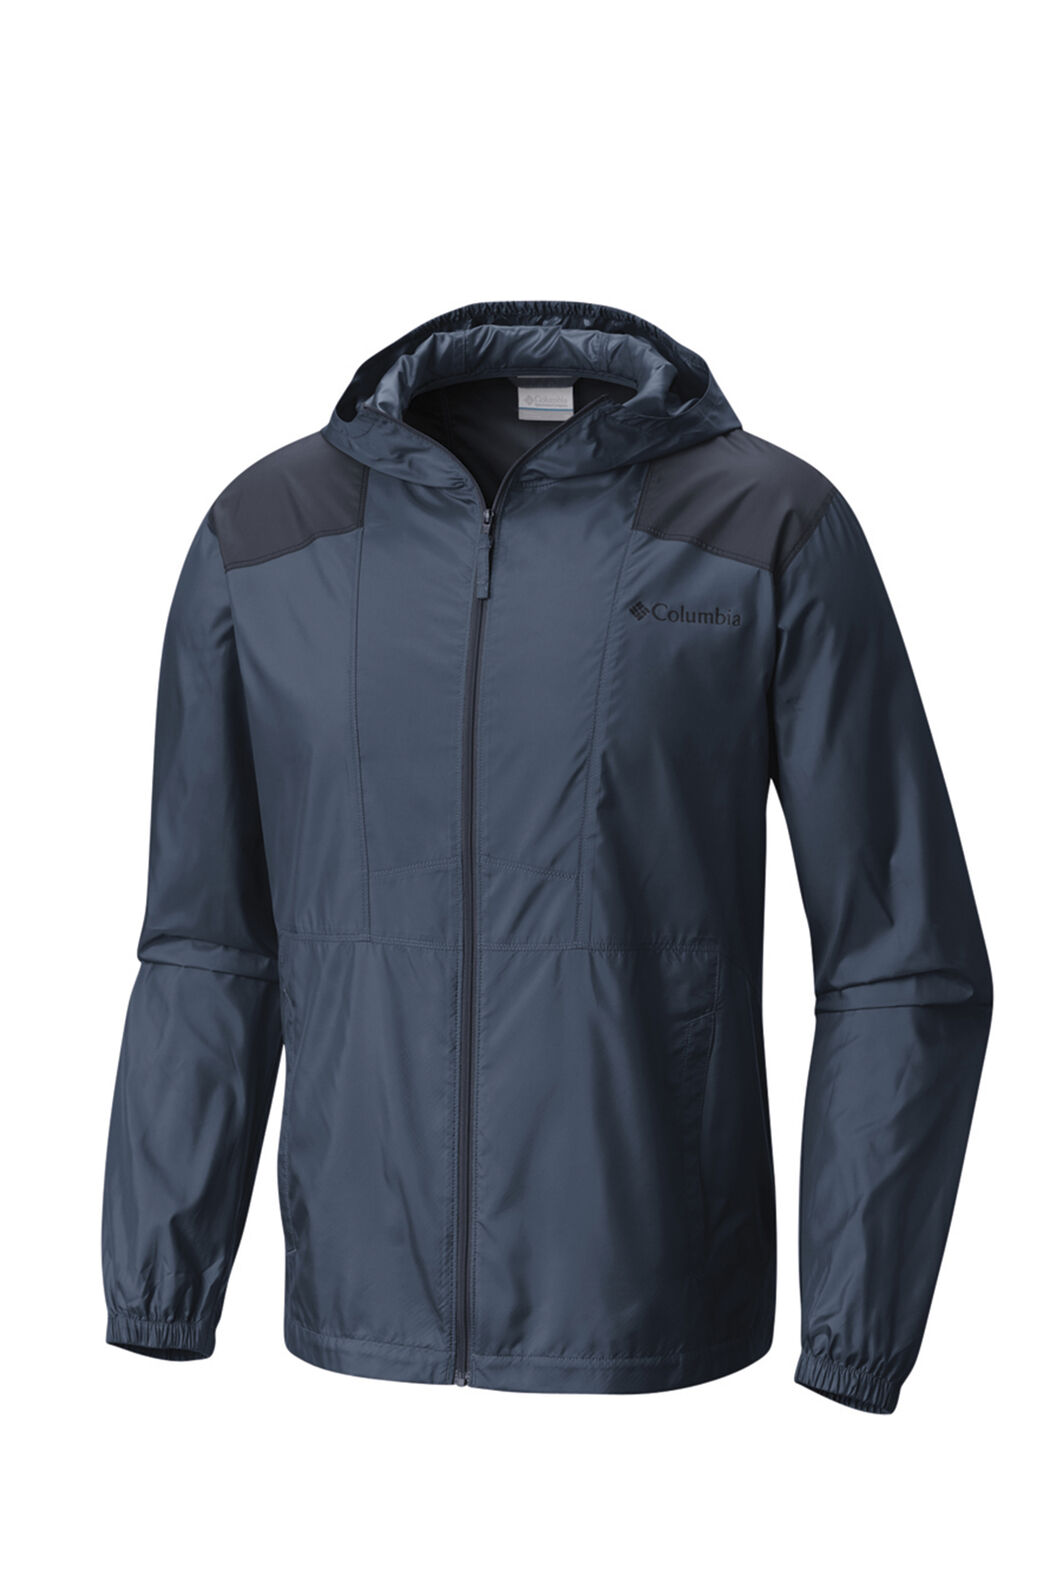 Columbia Men's Flashback Windbreaker Jacket, WHALE, hi-res